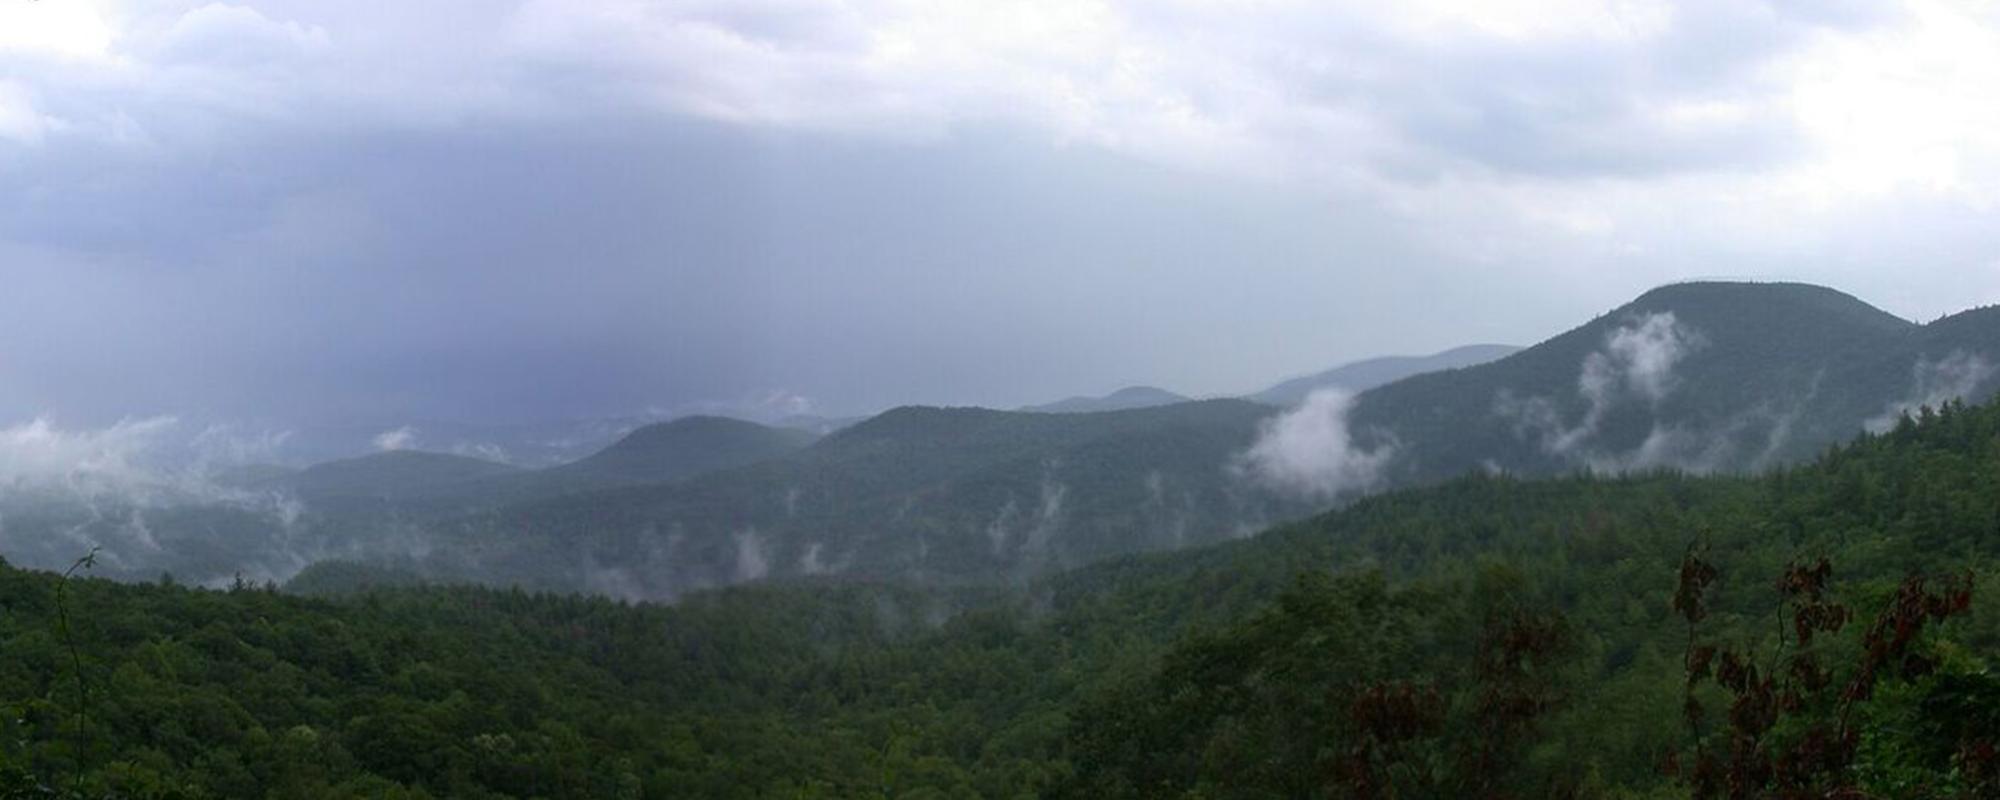 Biodiversity of the Southern Appalachians